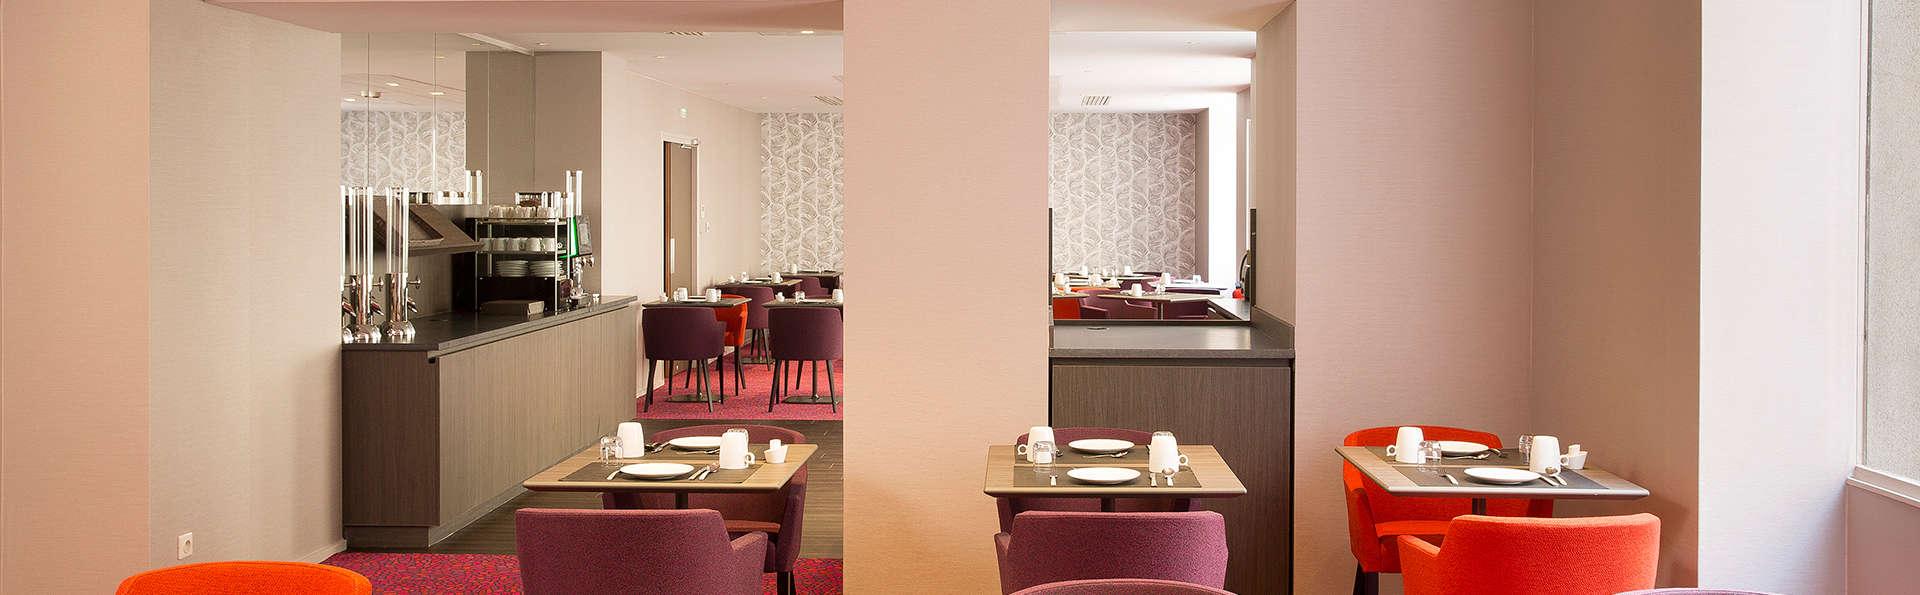 Oceania Hotel de France Nantes - EDIT_breakfast.jpg